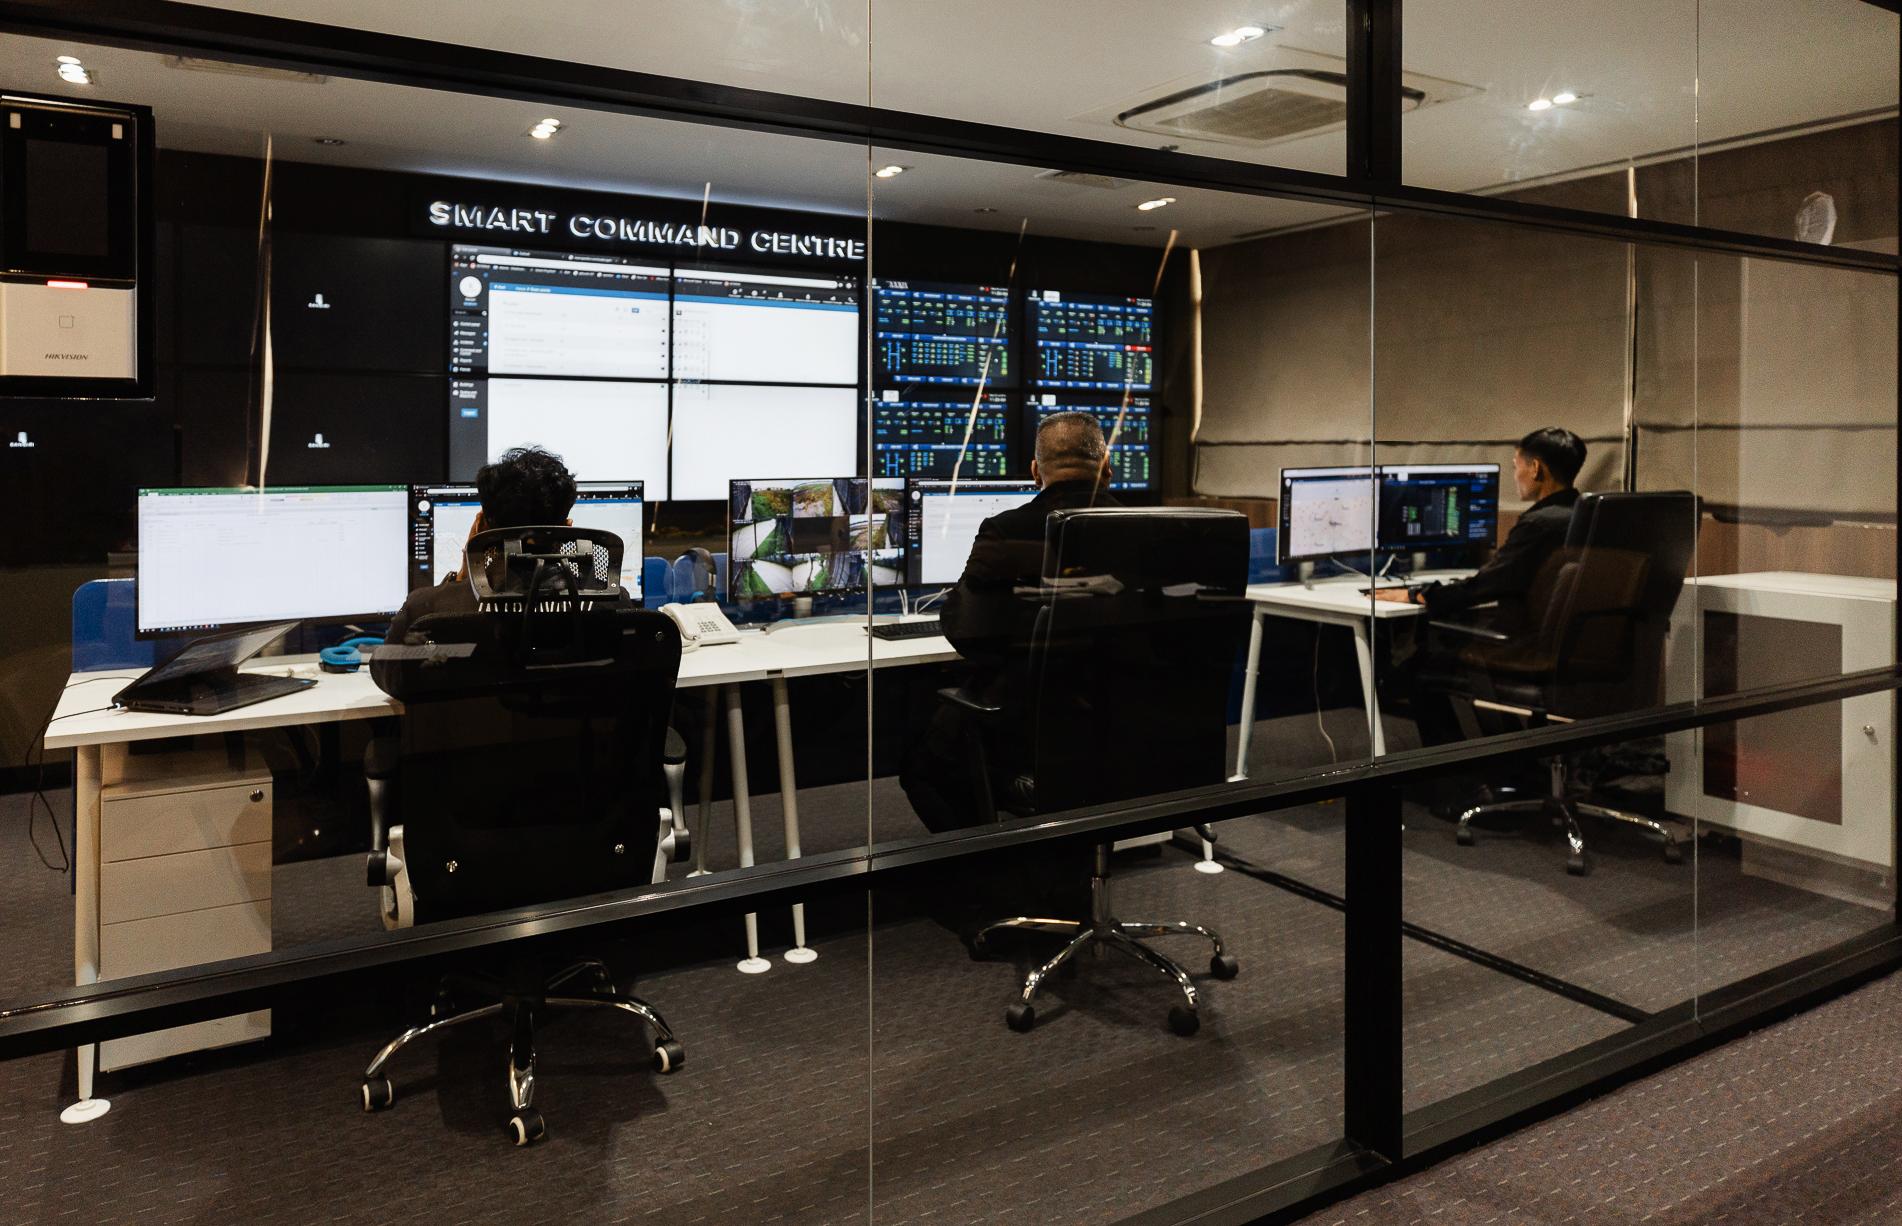 smart command centre sansiri